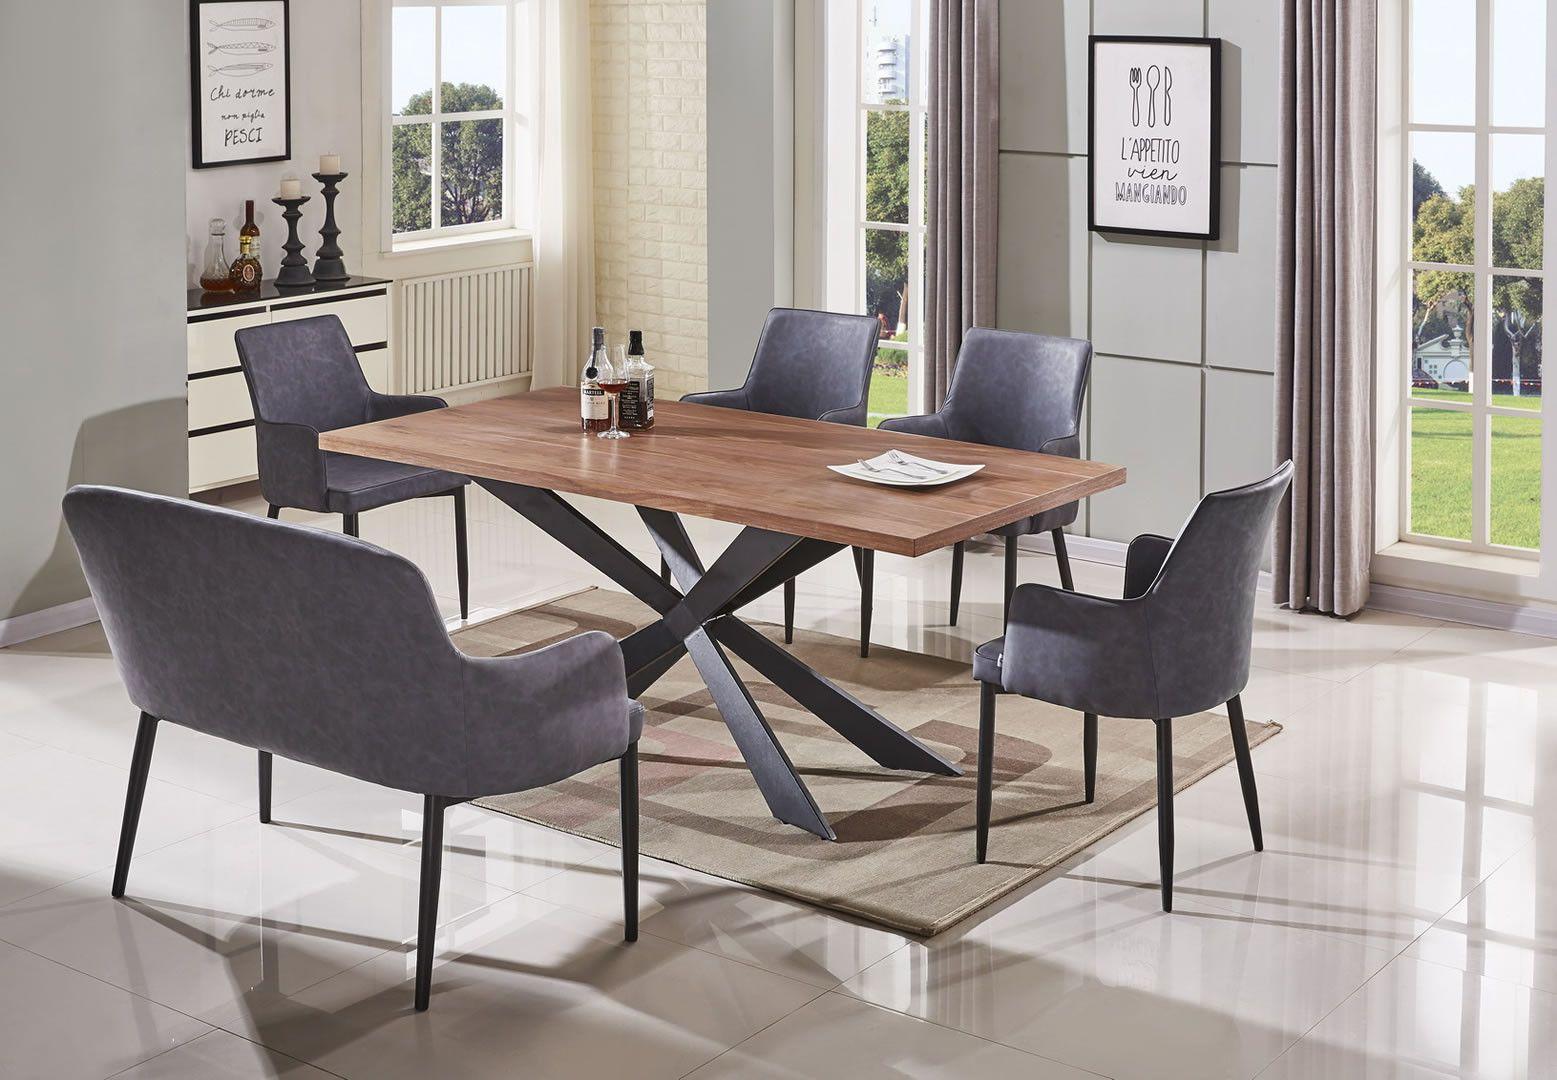 Salle manger table de salle manger style industriel loft 180 cm trocity - Table salle a manger loft ...